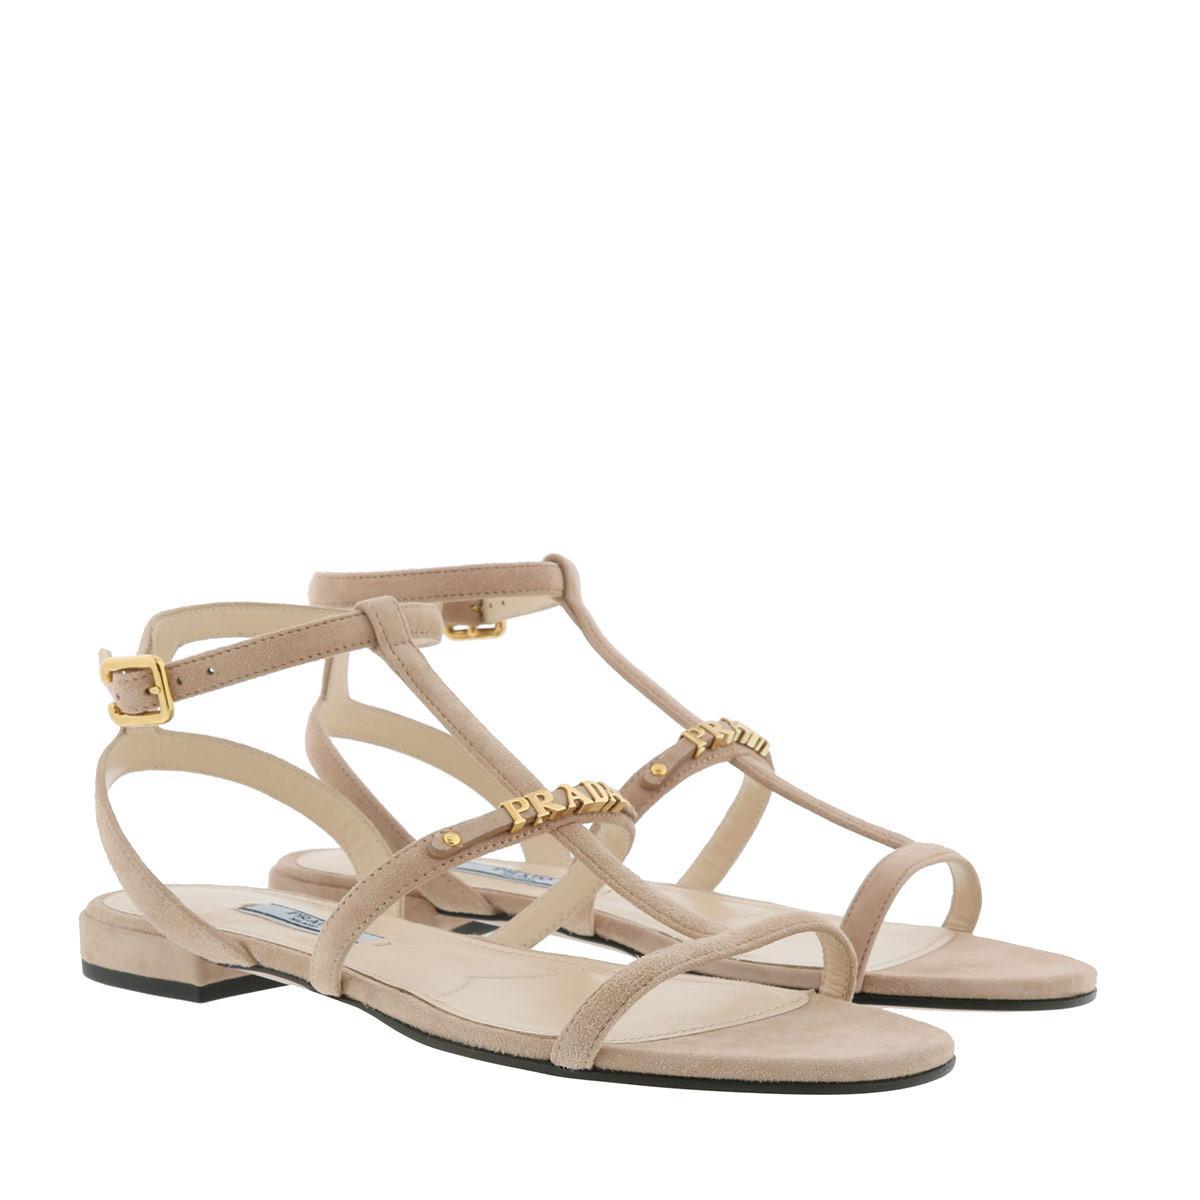 22c2f4aae1642f Camoscio piel natural planas de en Prada cabra desnuda sandalias Lyst  FtgqnwpE